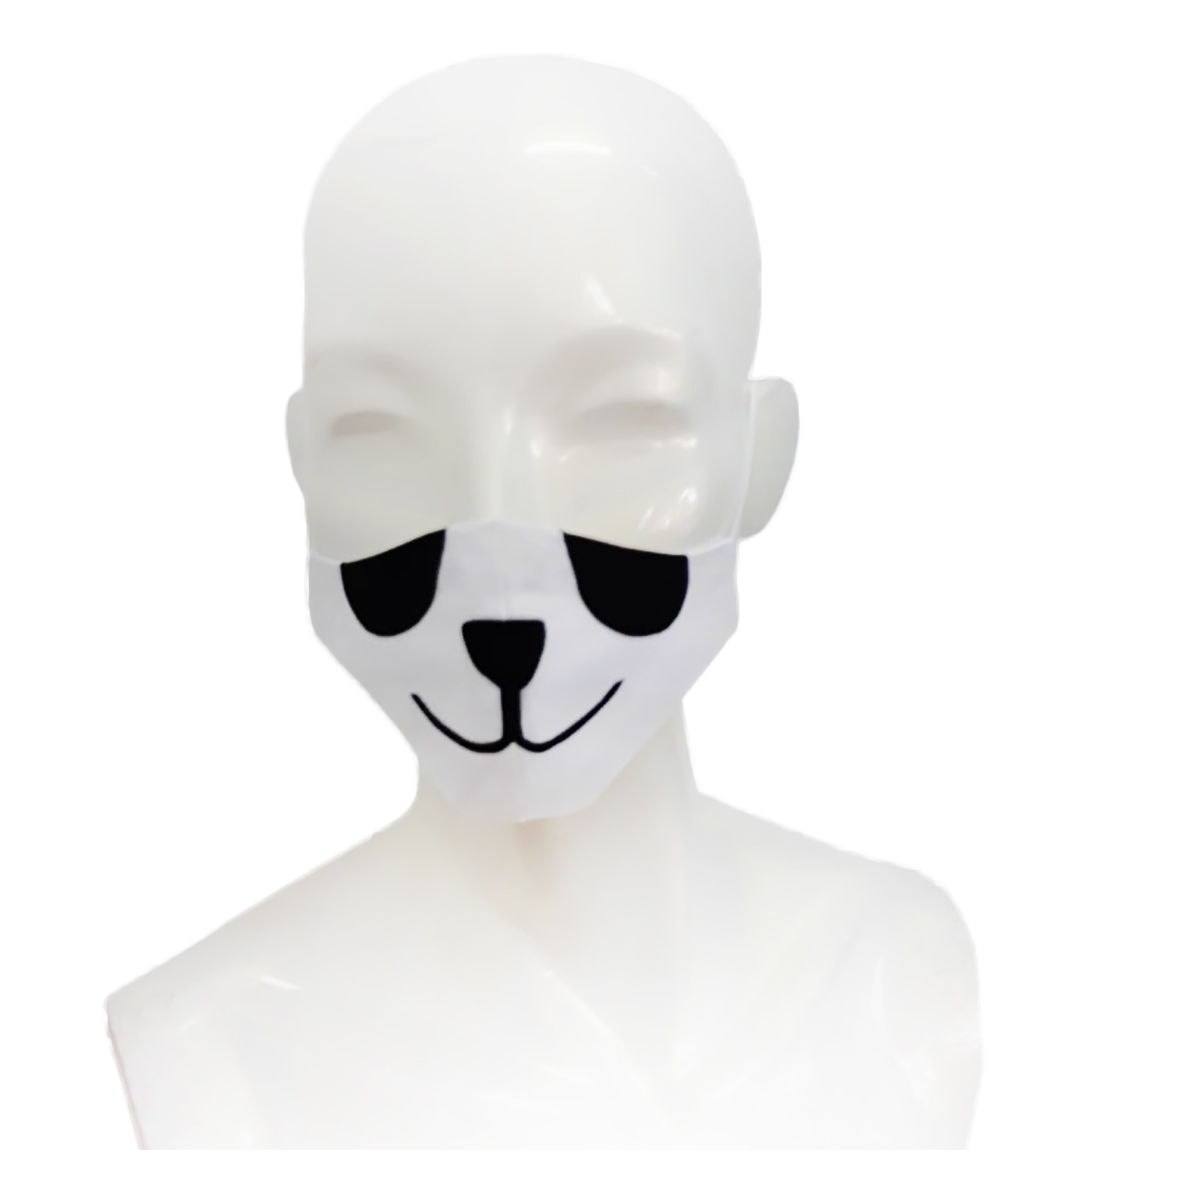 Masca de fata, copii 6-12 ani, forma anatomica, reutilizabila, Noriel, Panda imagine